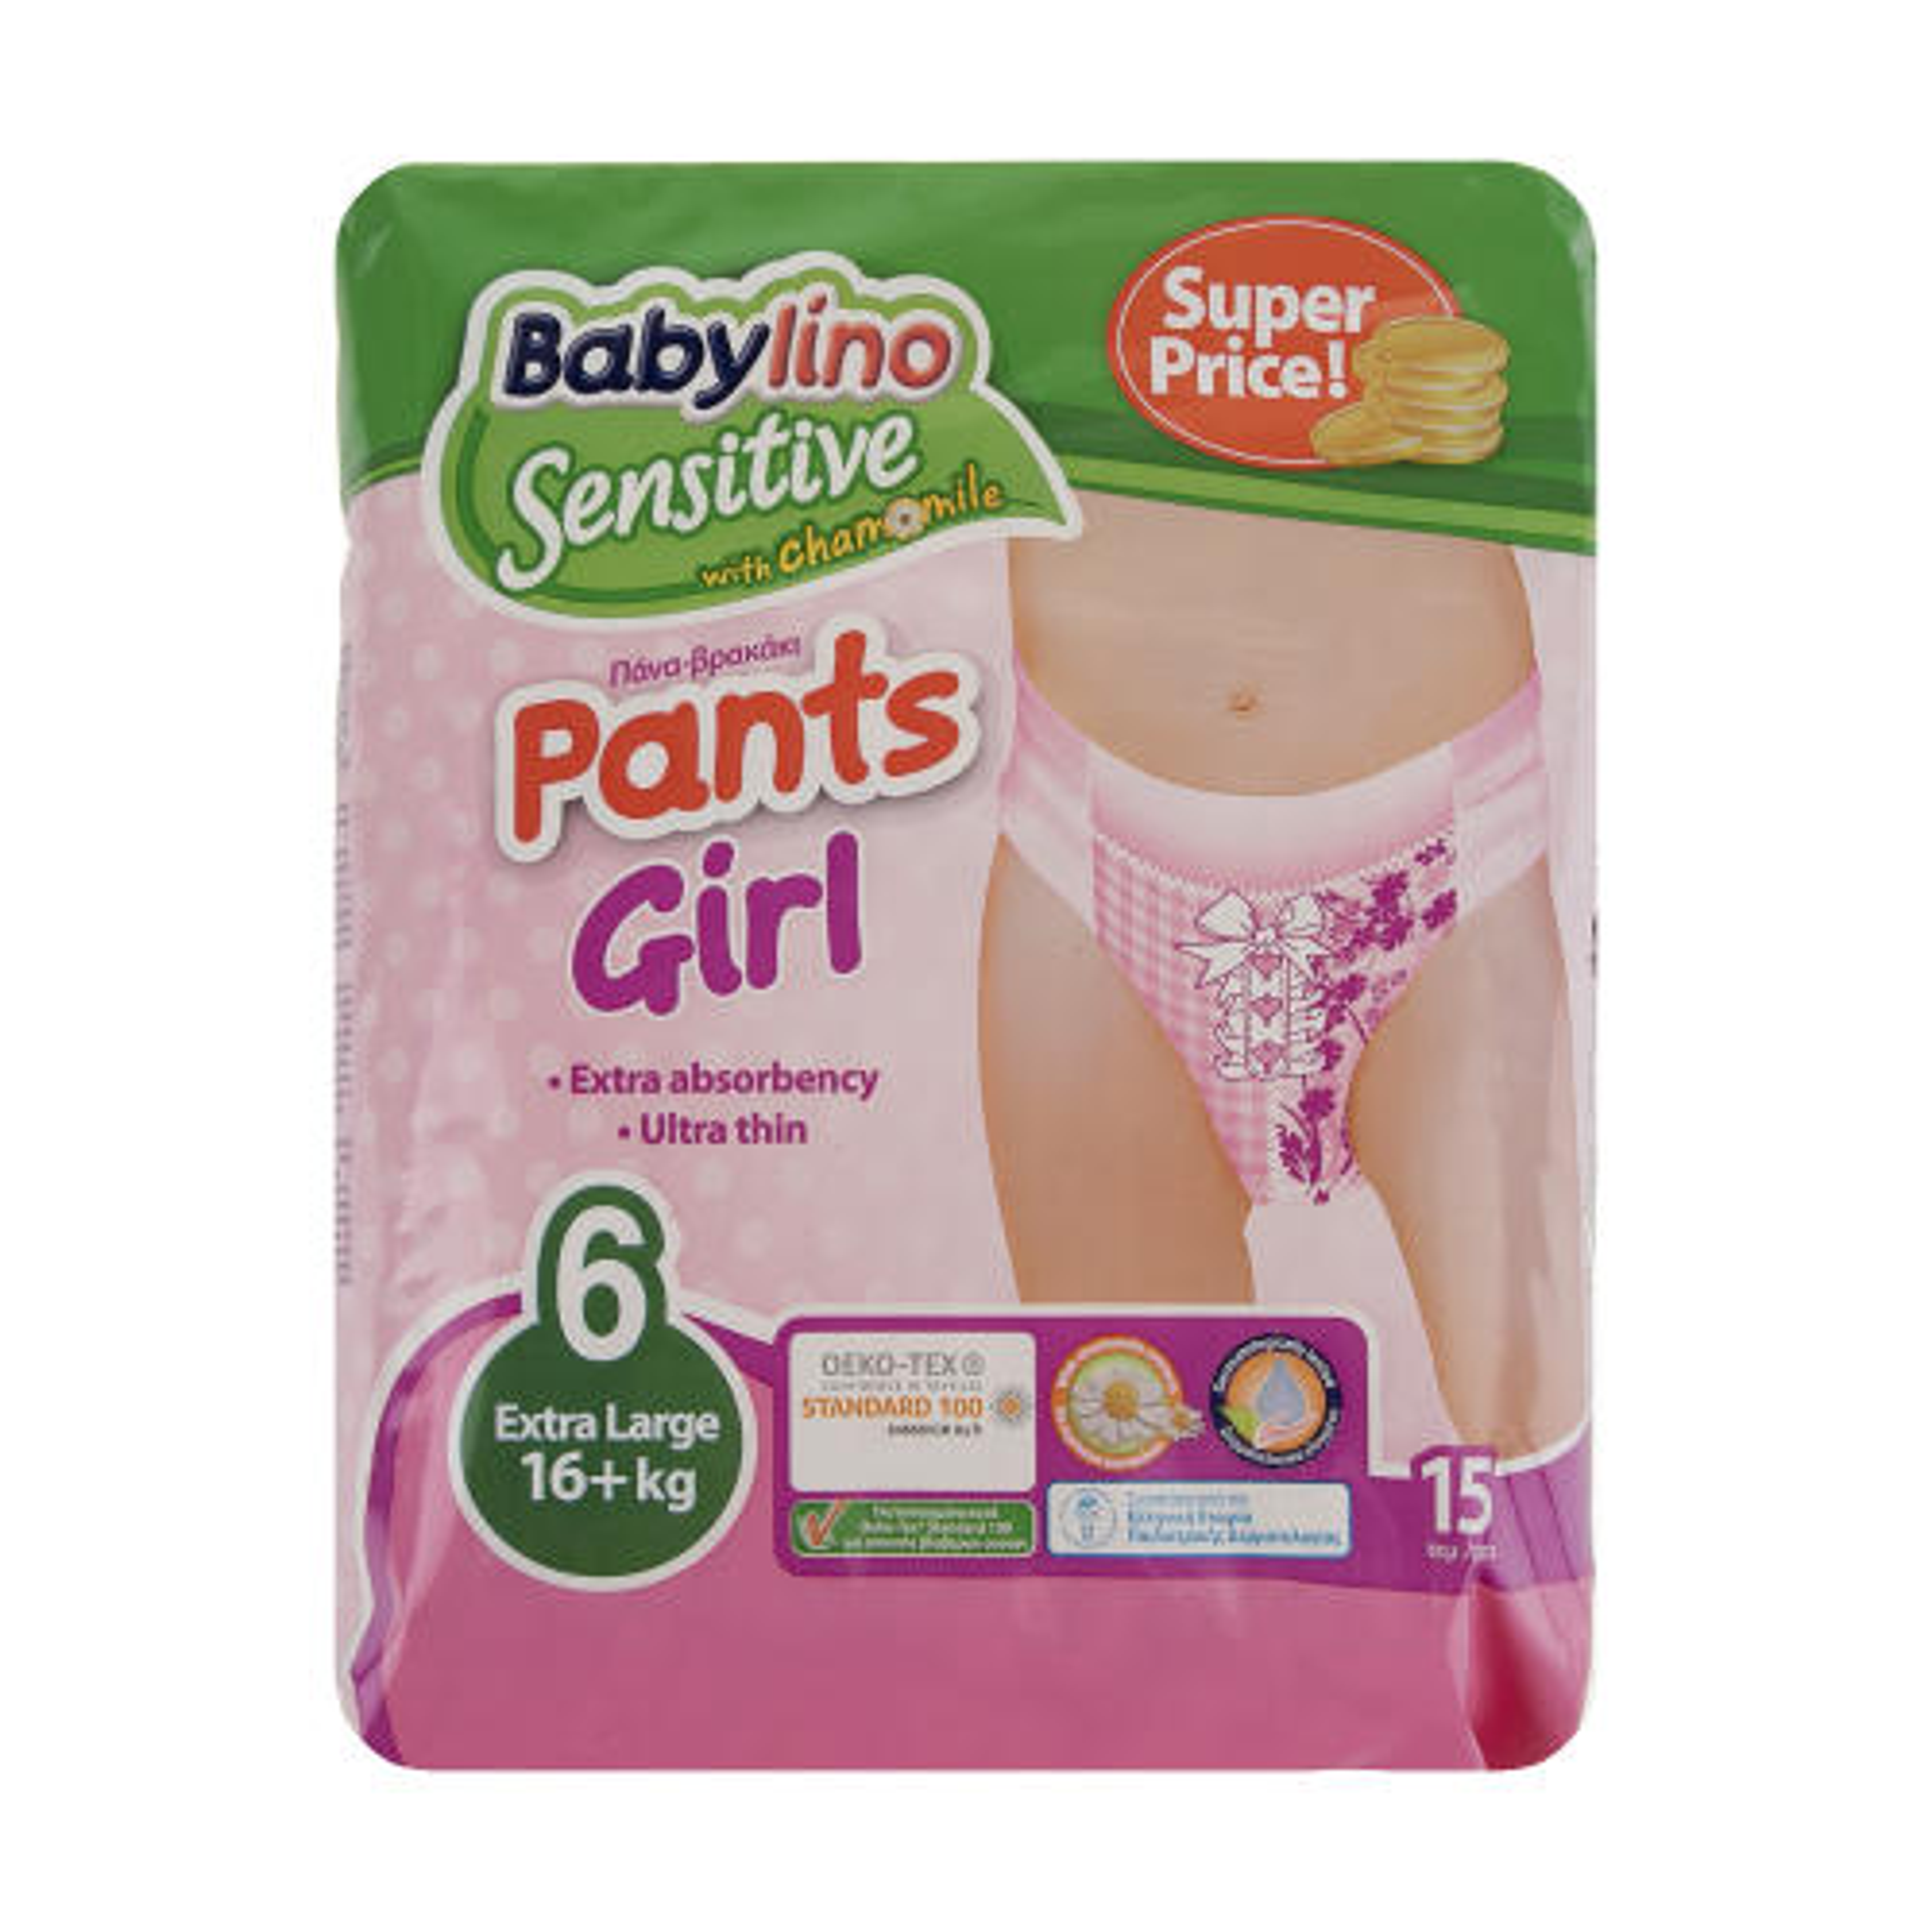 پوشک شورتی ضد حساسیت بیبی لینو مدل Pants Girl سایز 6 بسته 15 عددی